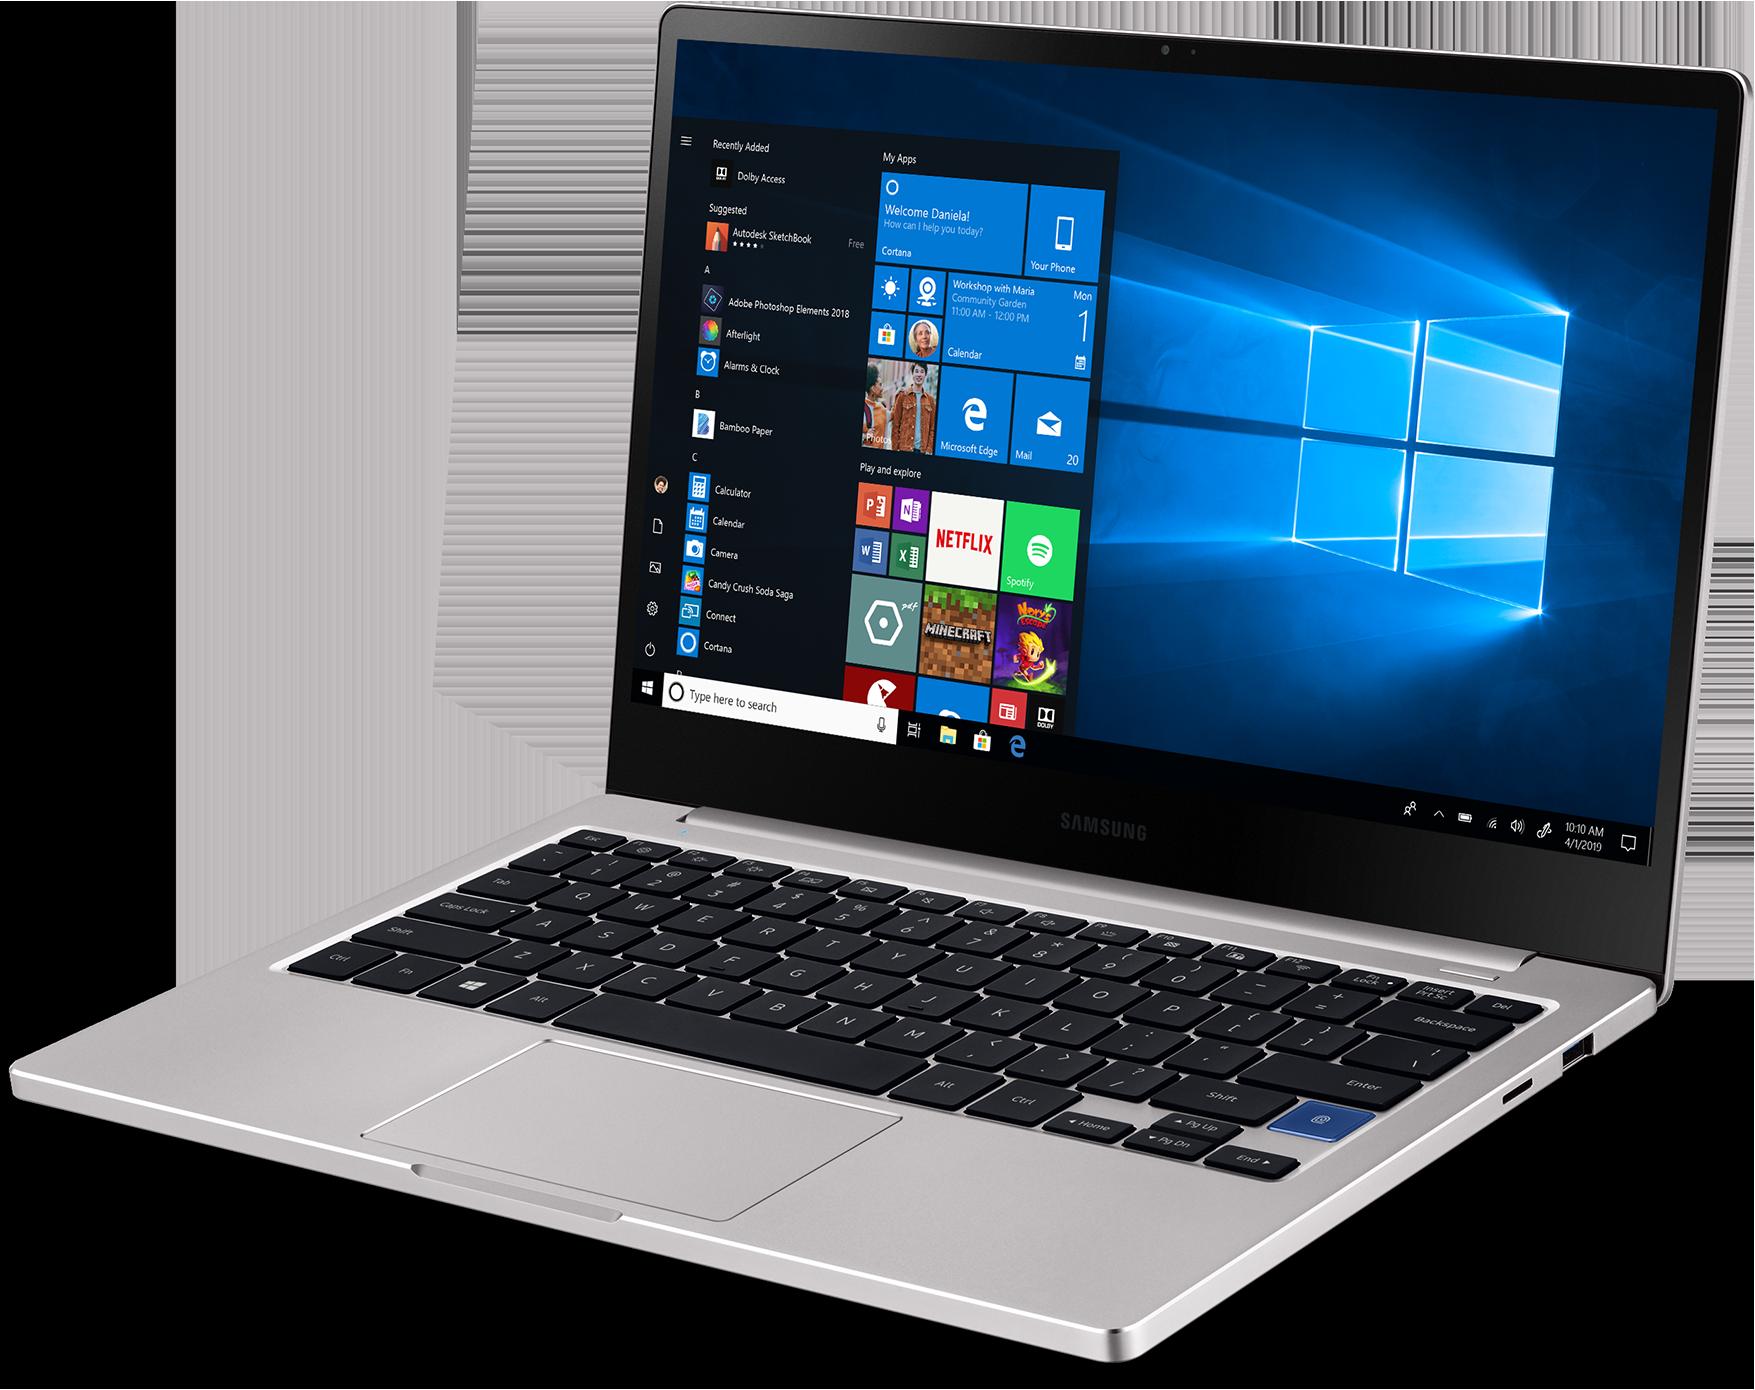 RE3iY9I?ver=ace3 - Samsung Notebook 7 NP730XBE-K01US Laptop